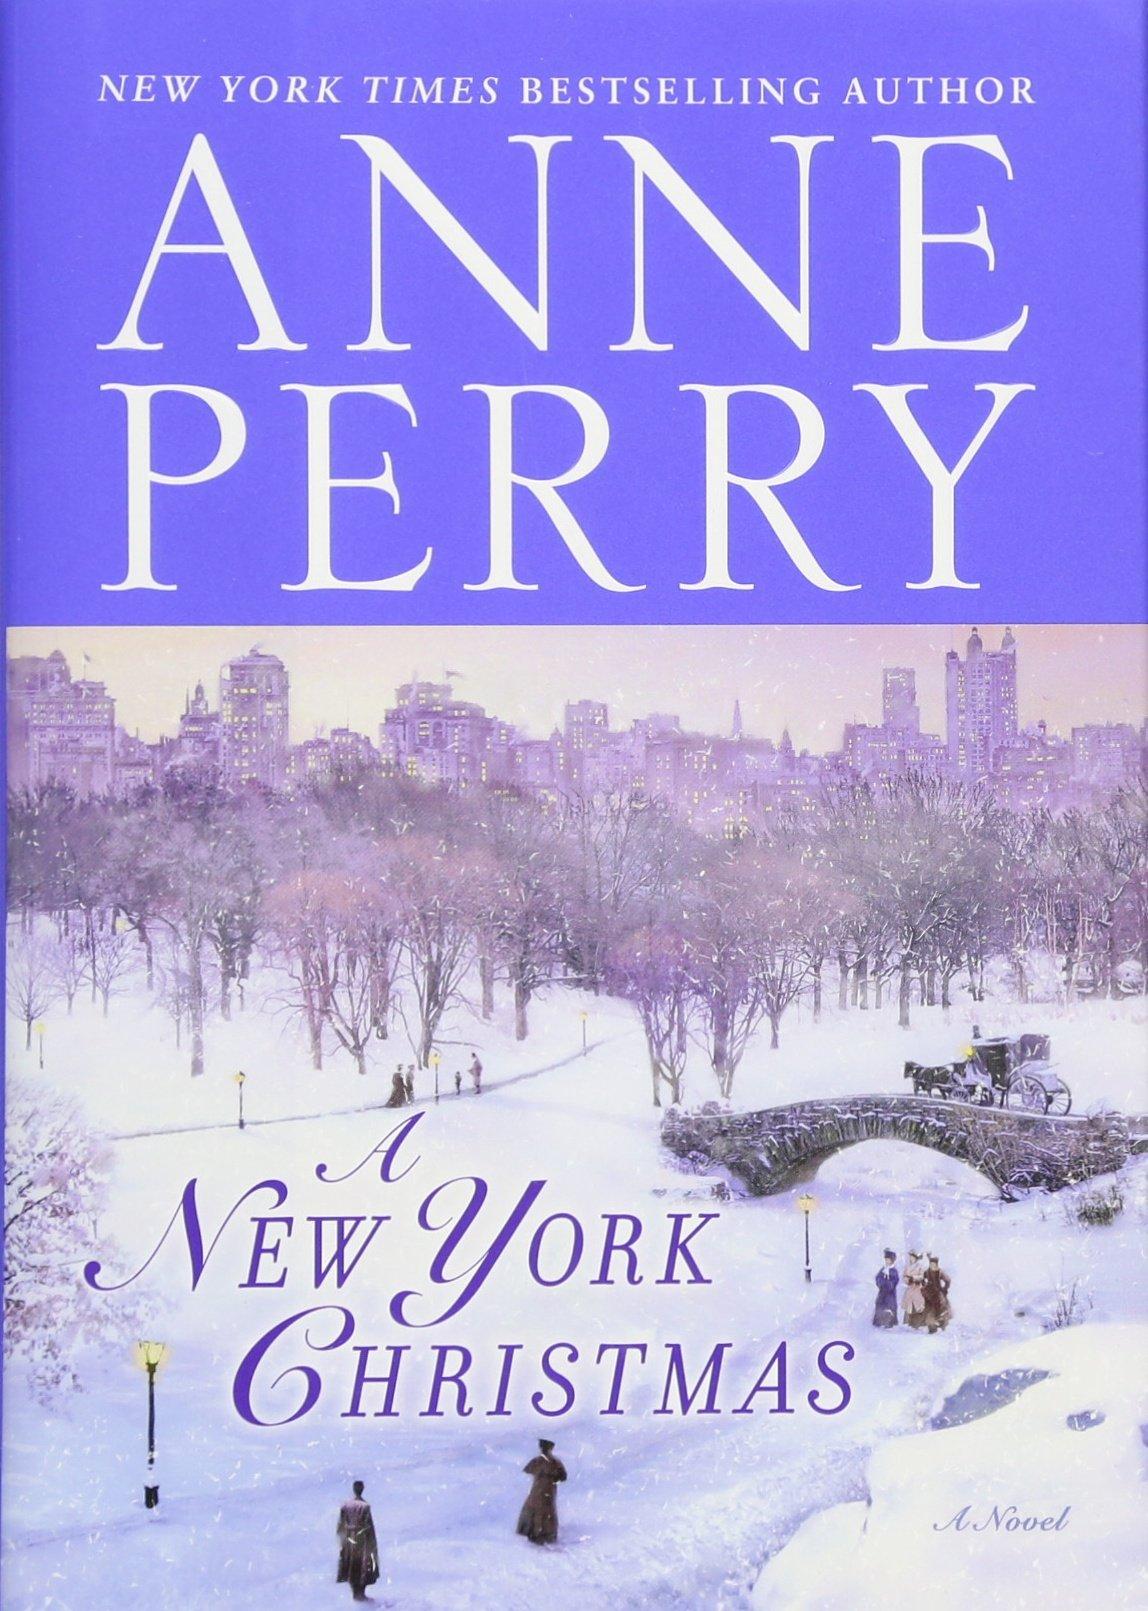 New York Christmas Novel